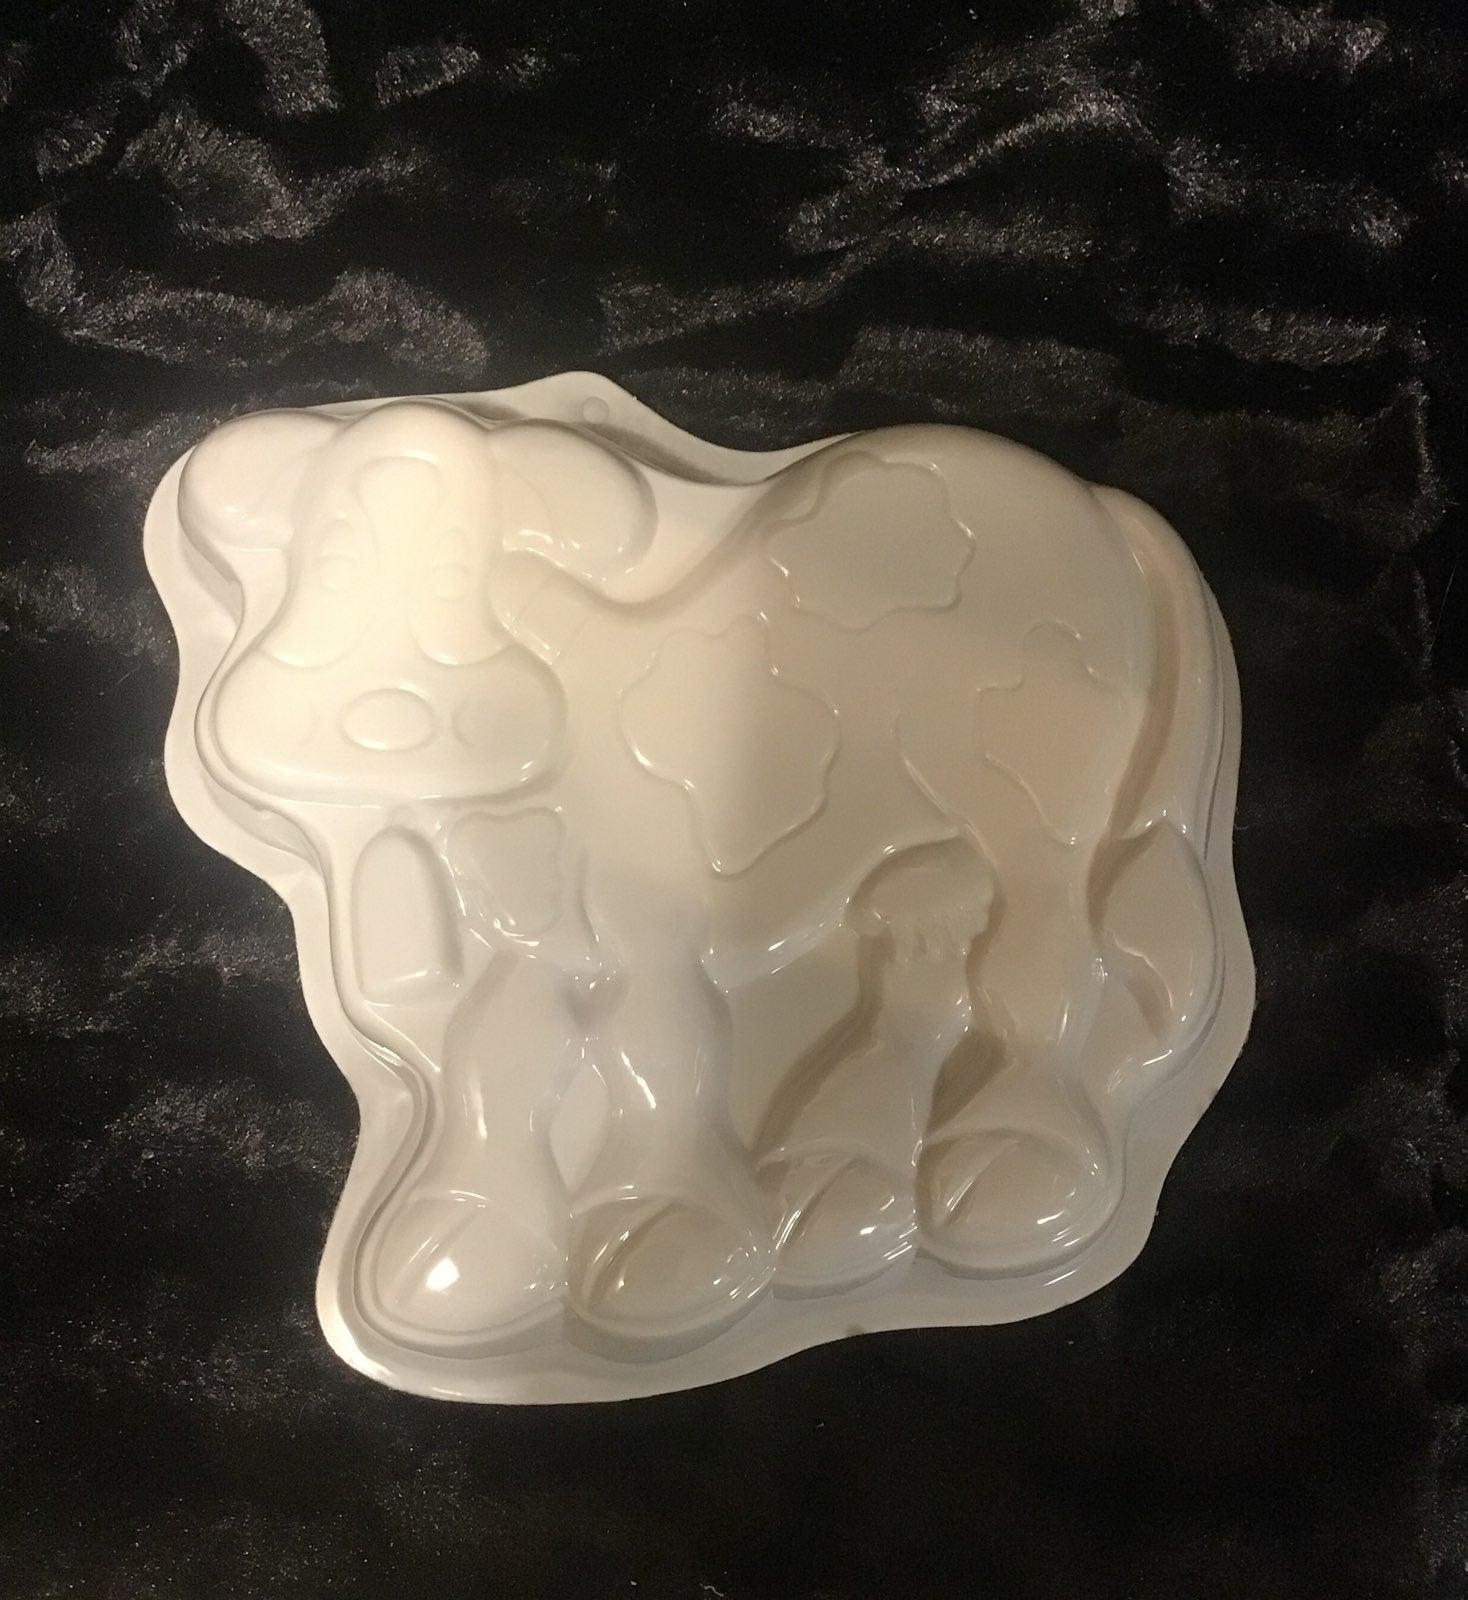 Cow Cakepan